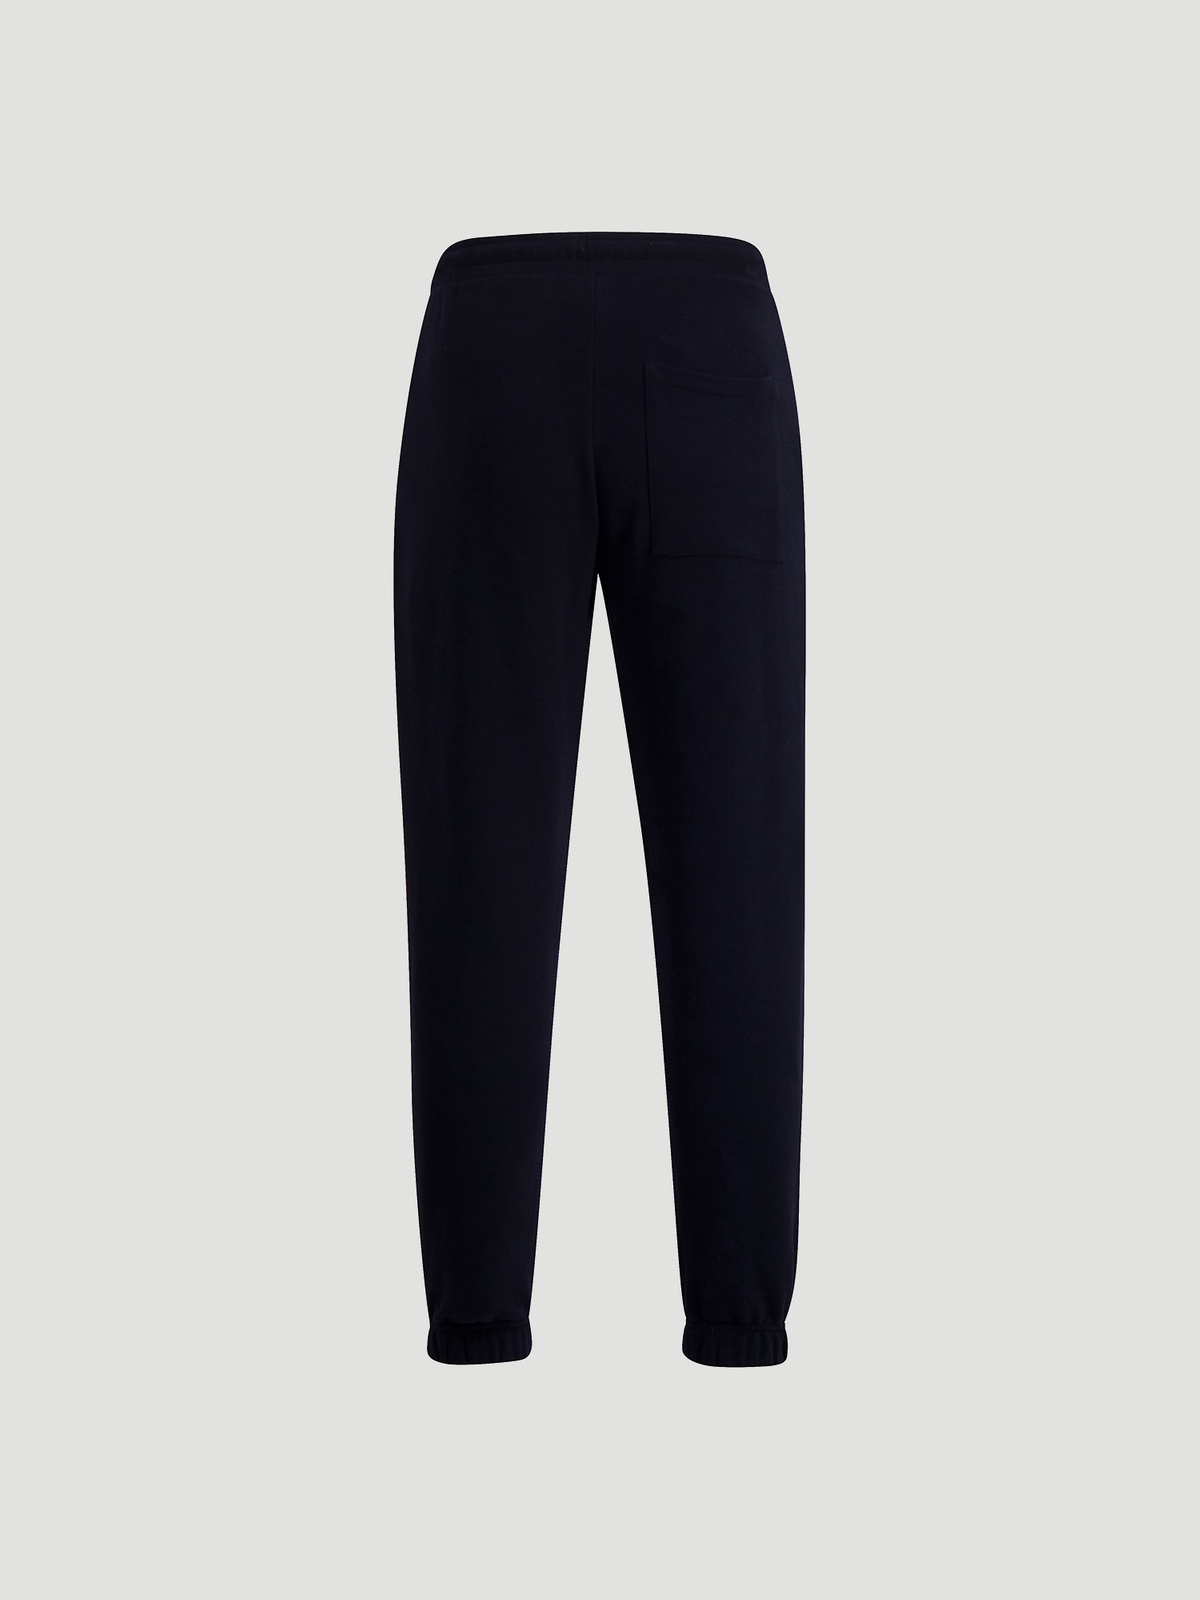 M. Oslo Sweat Trouser Black 5